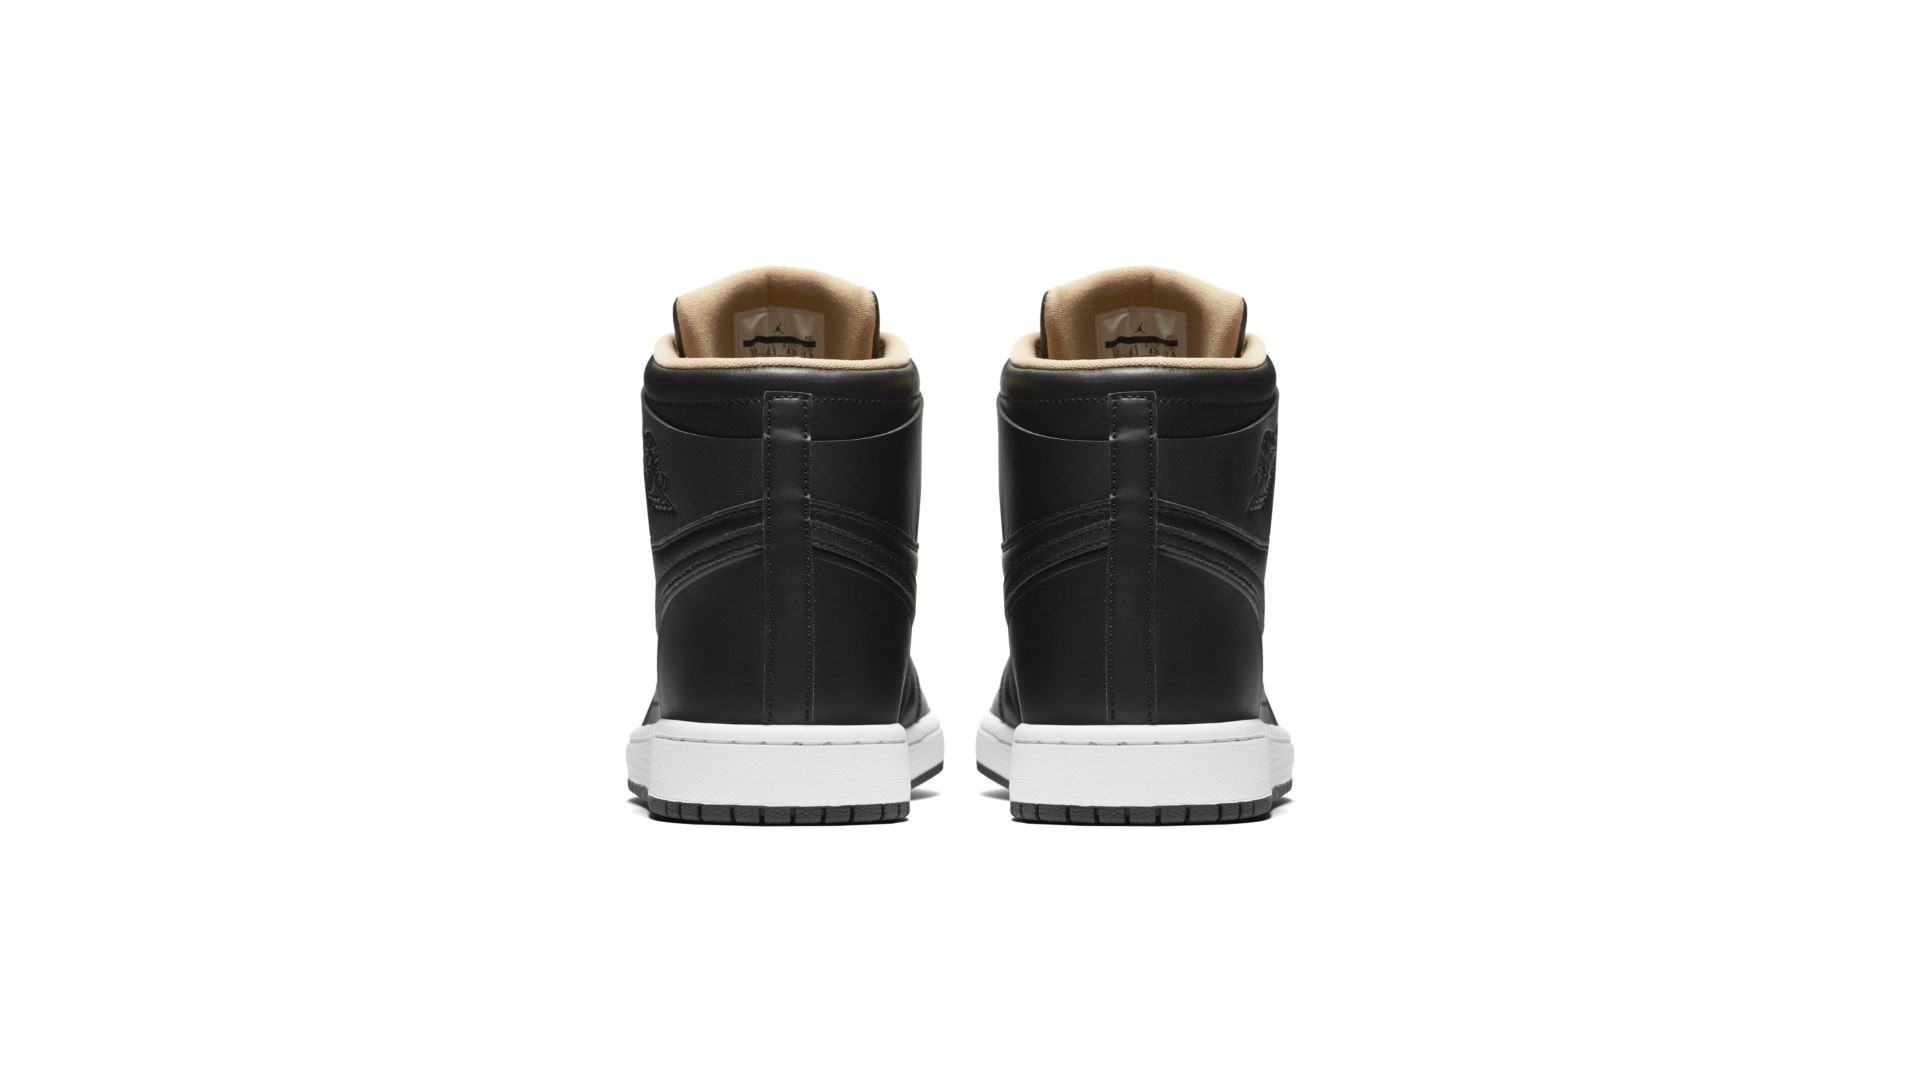 Jordan 1 Retro Black Vachetta Tan (845018-030)